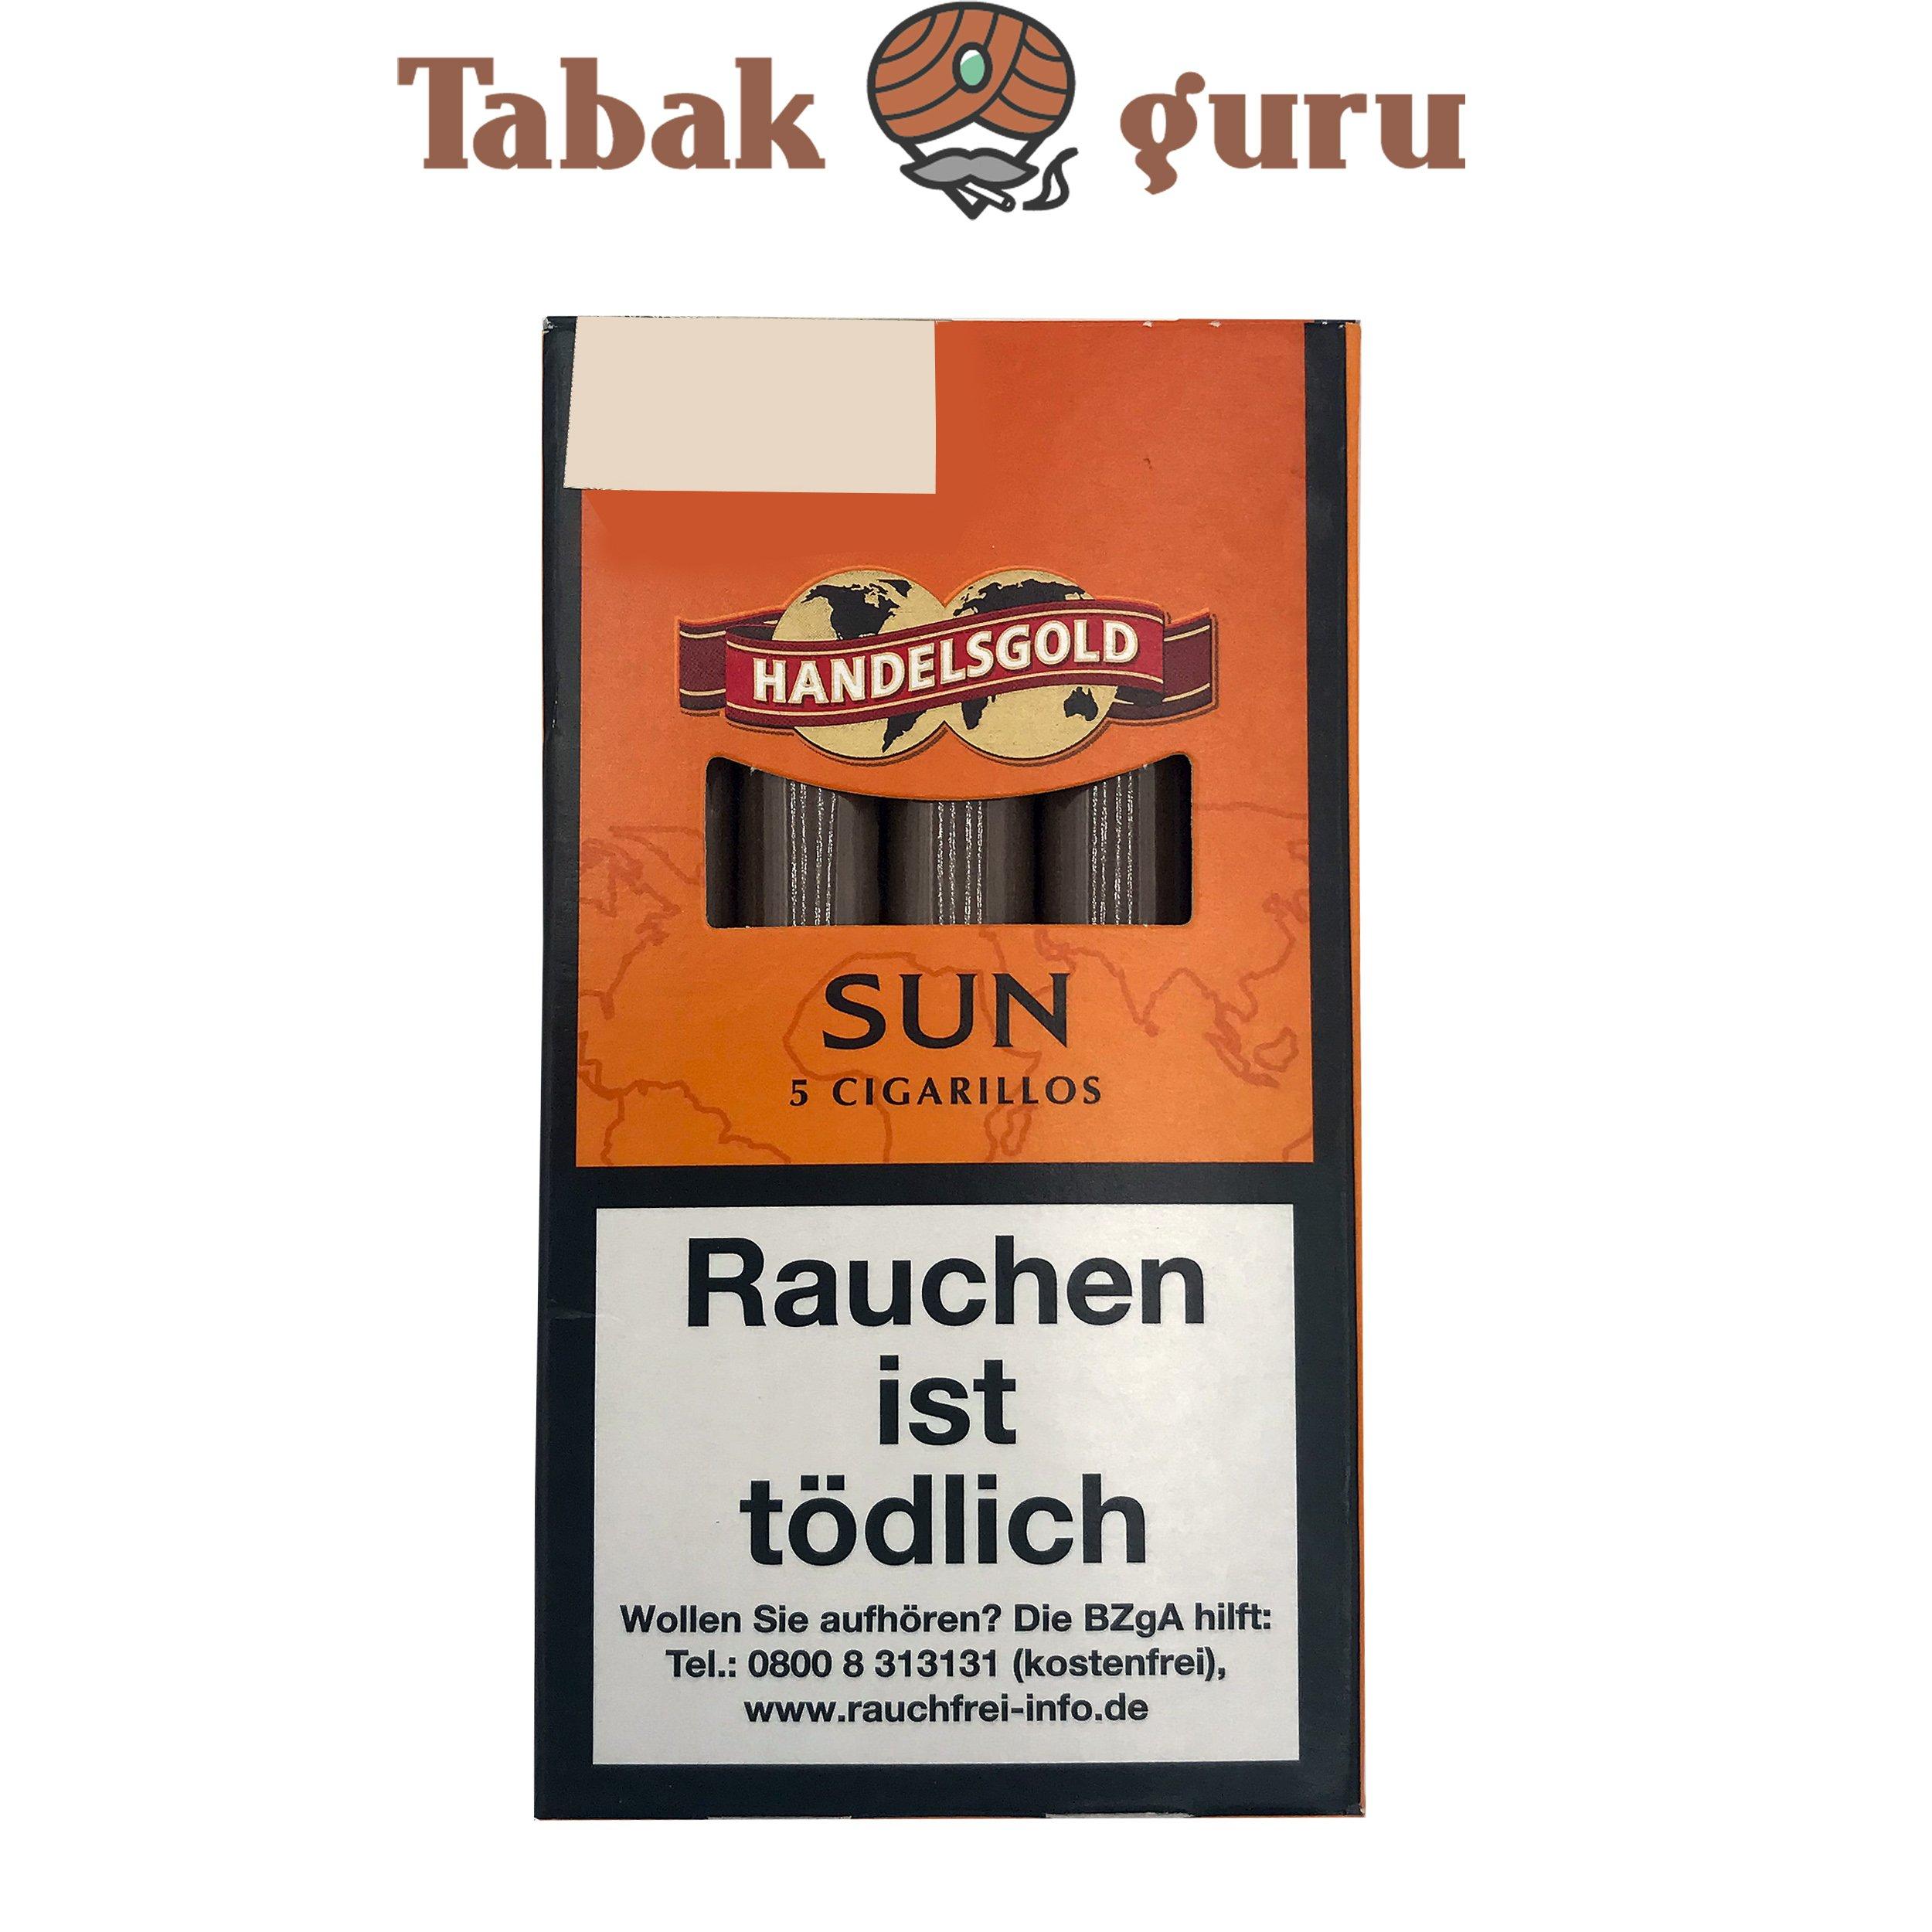 Handelsgold Sun No. 209 Filterzigarillos a 5 Stück